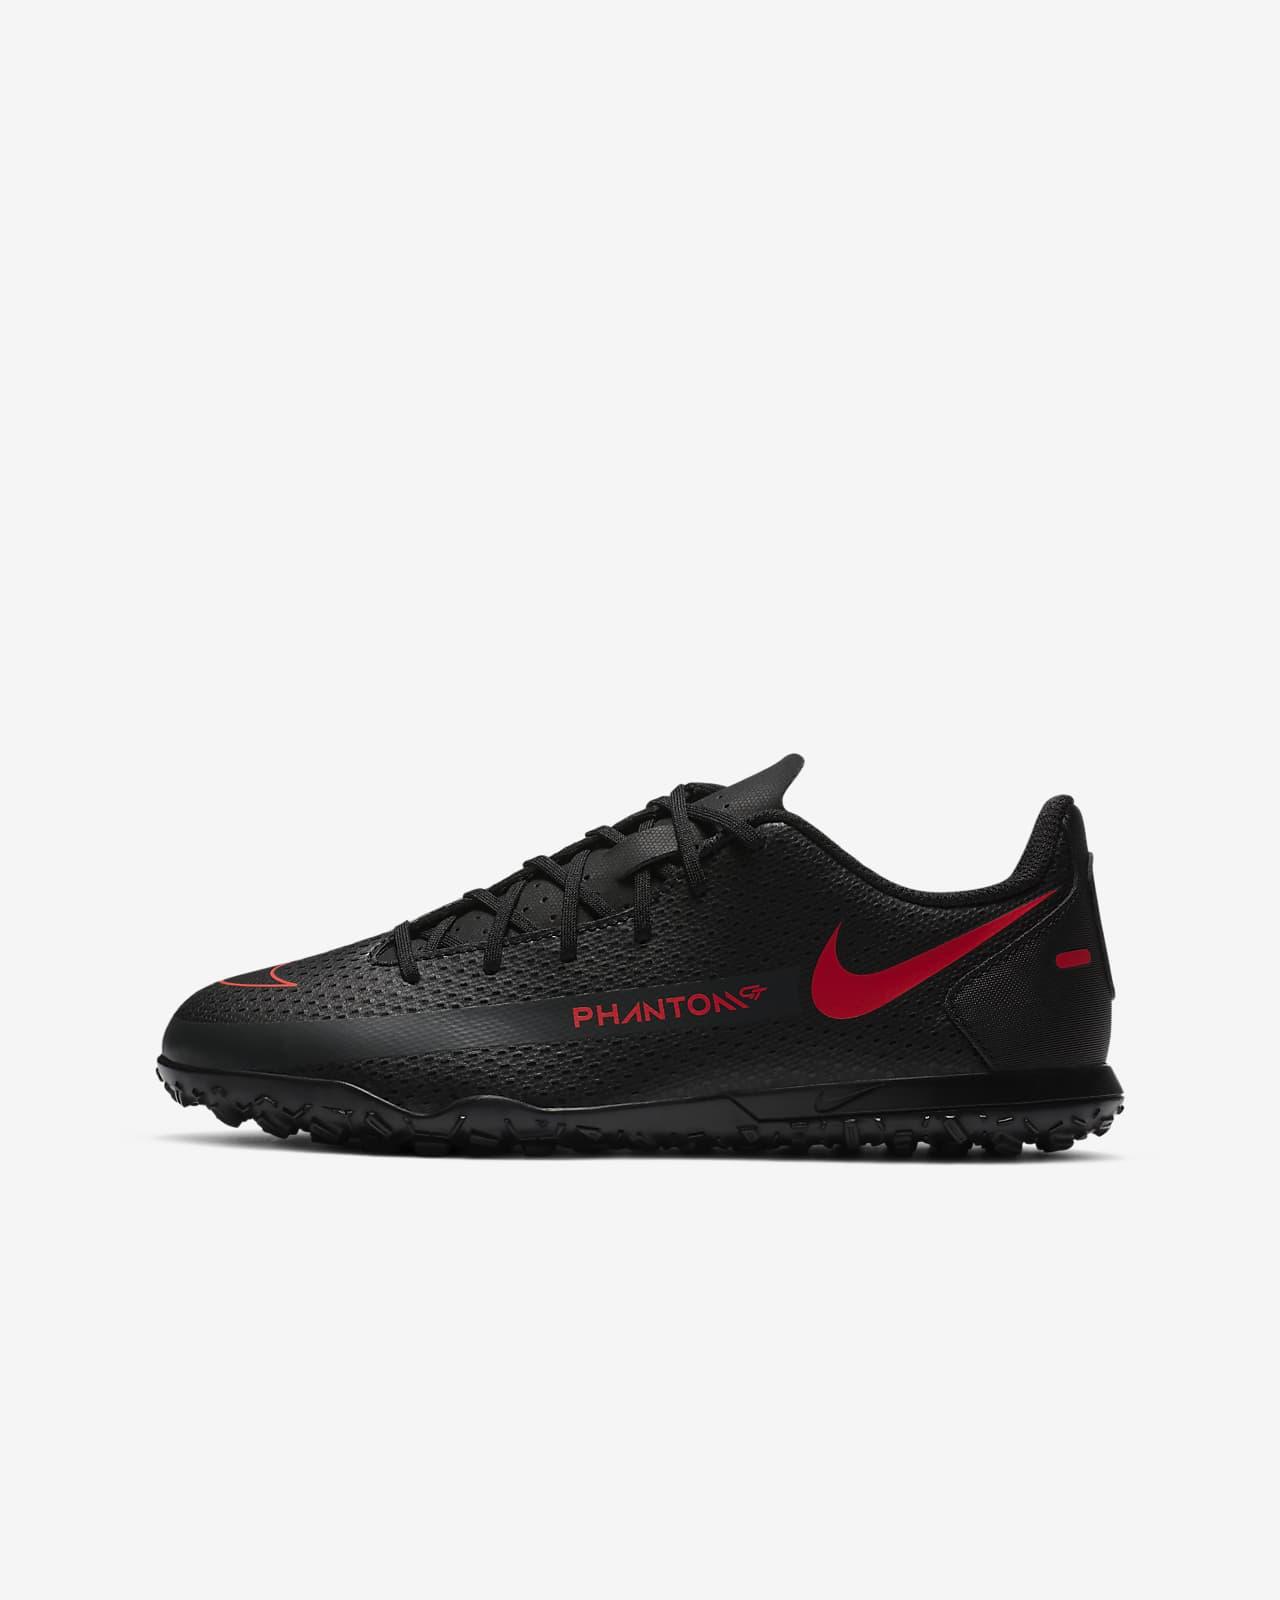 Nike Jr. Phantom GT Club TF Little/Big Kids' Artificial-Turf Soccer Shoe